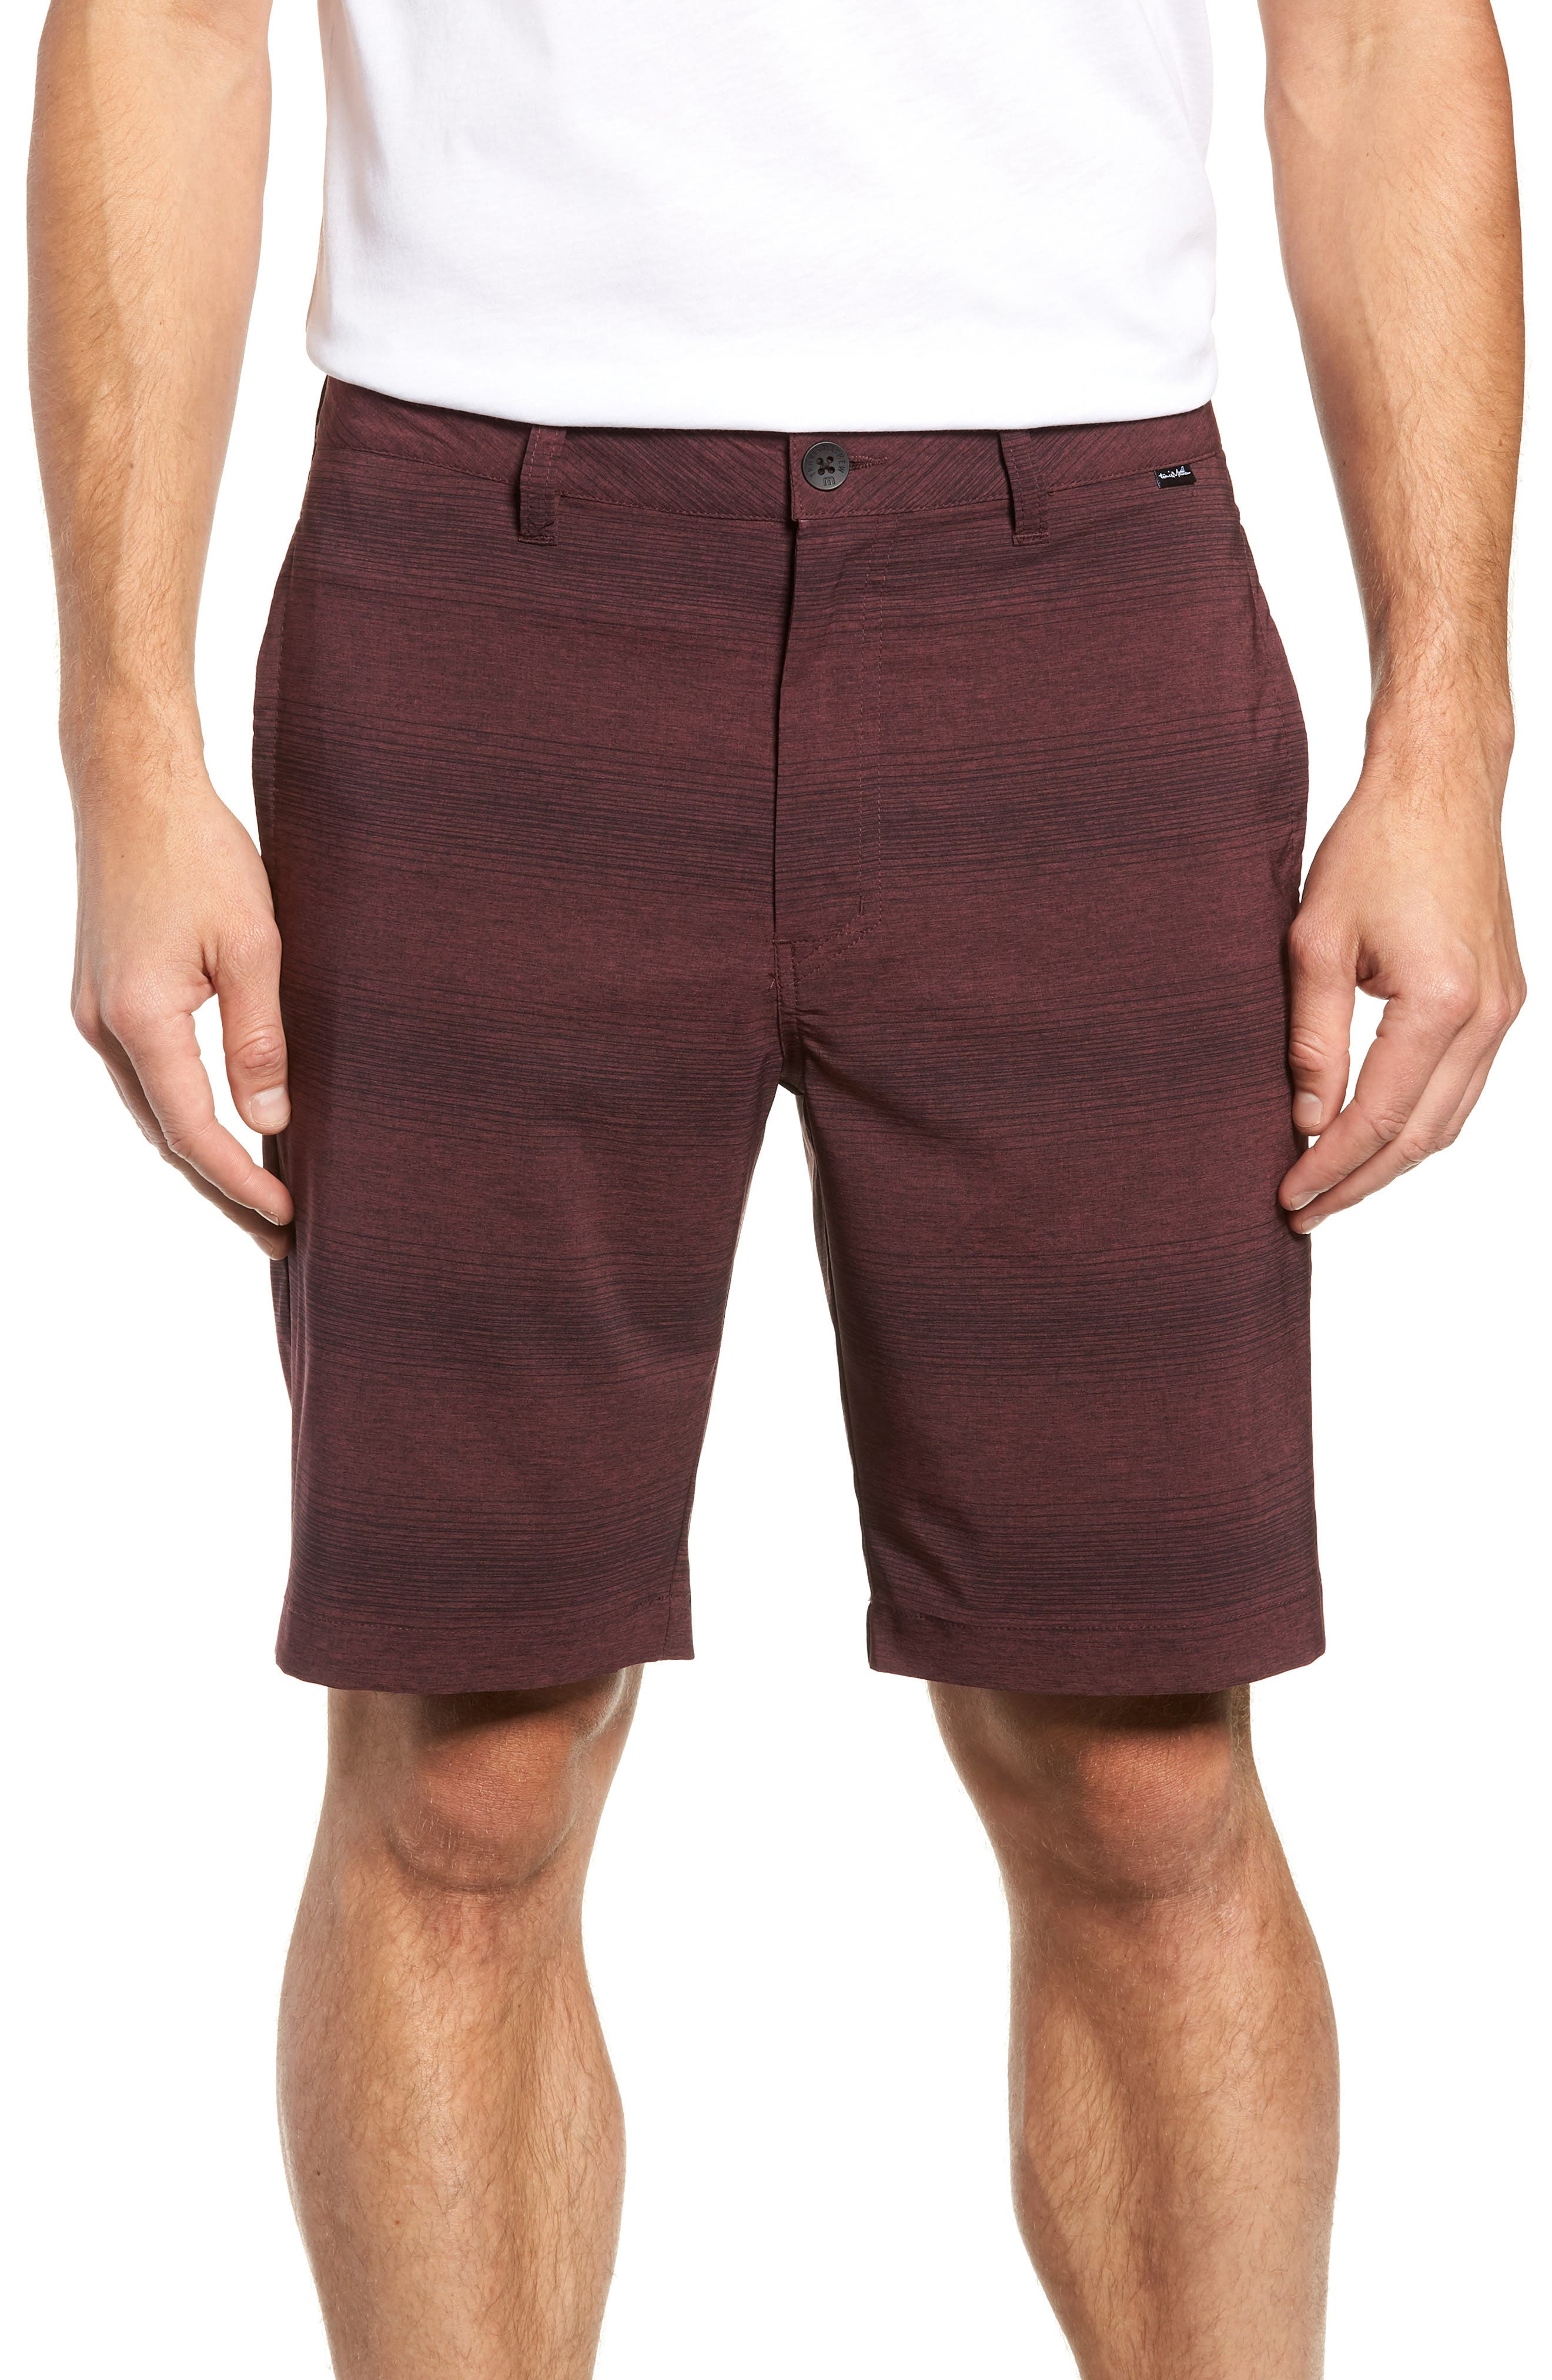 TRAVISMATHEW, Tepic Shorts, Main thumbnail 1, color, WINETASTING/ BLACK